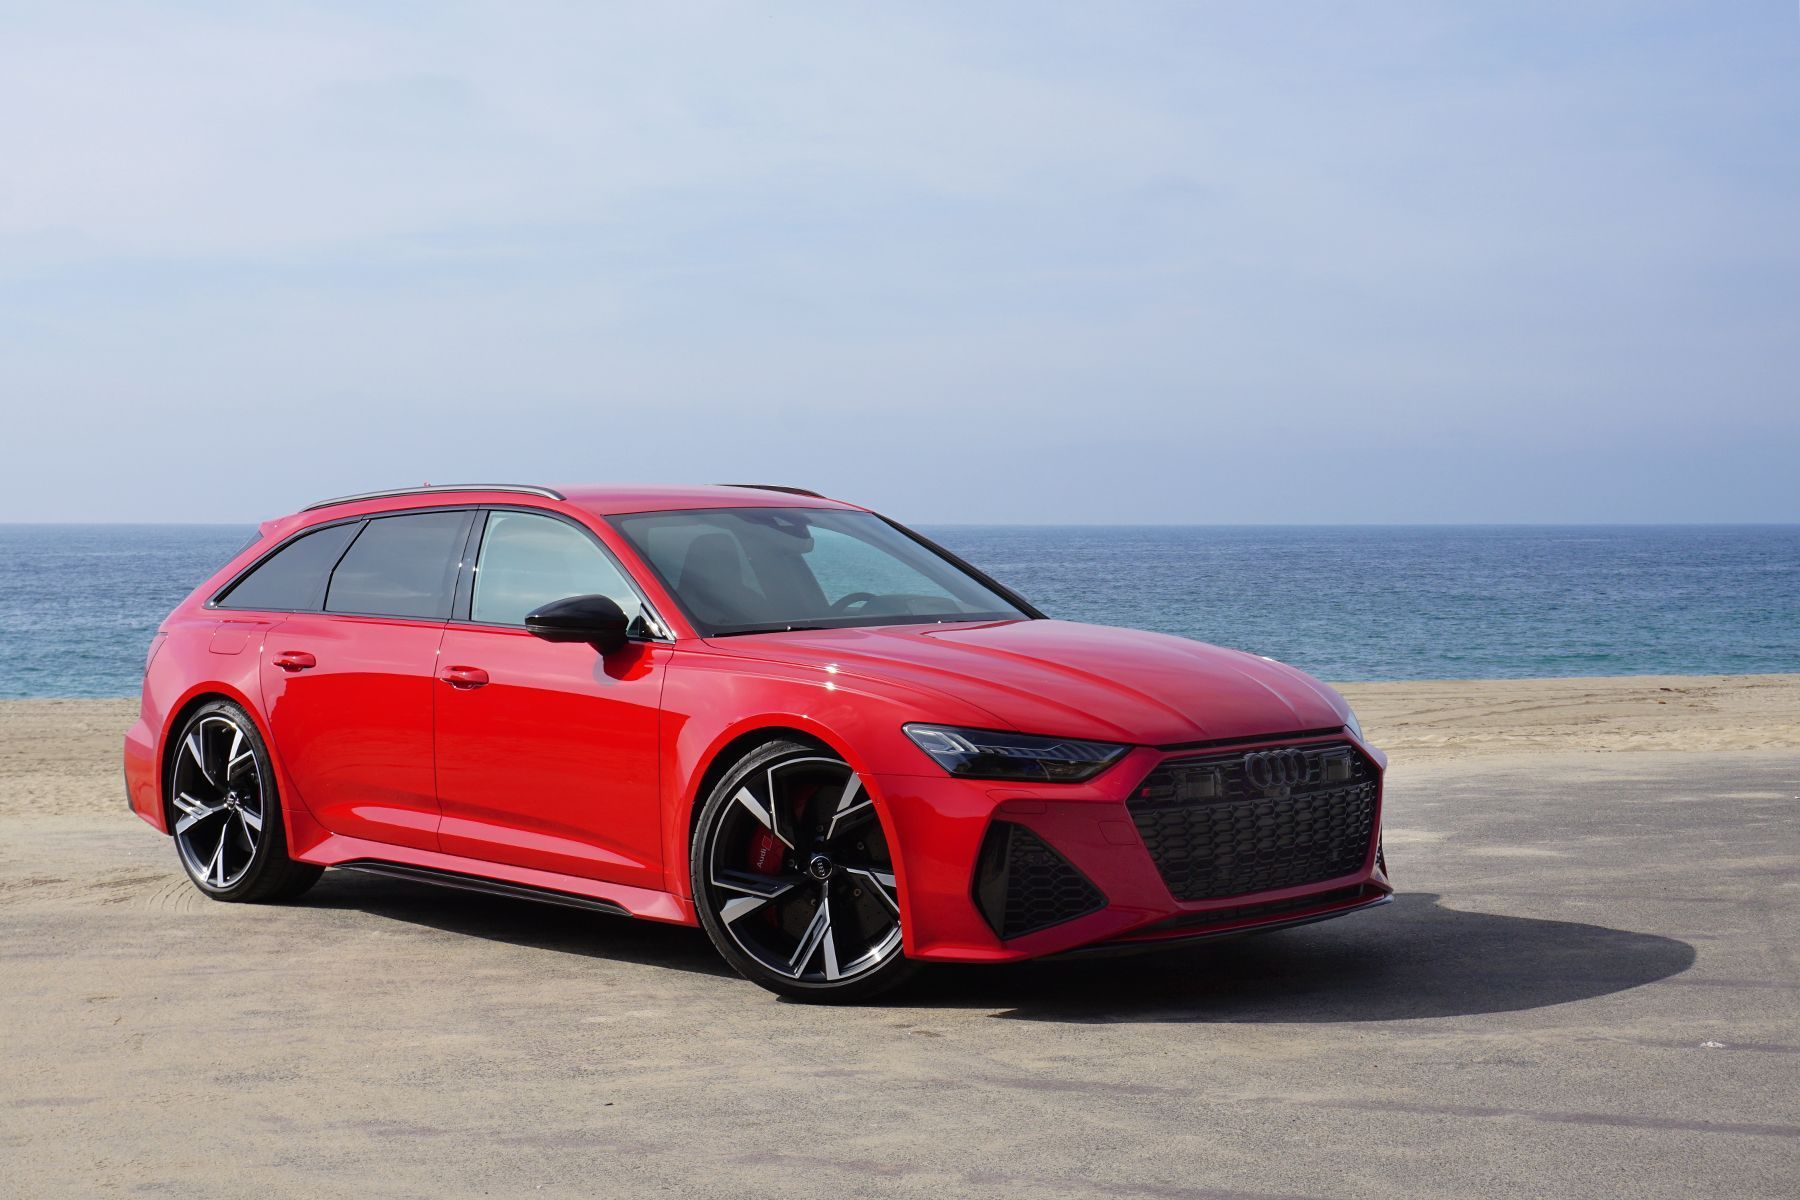 First Drive 2021 Audi Rs 6 Avant Audi Audi Rs Audi Rs5